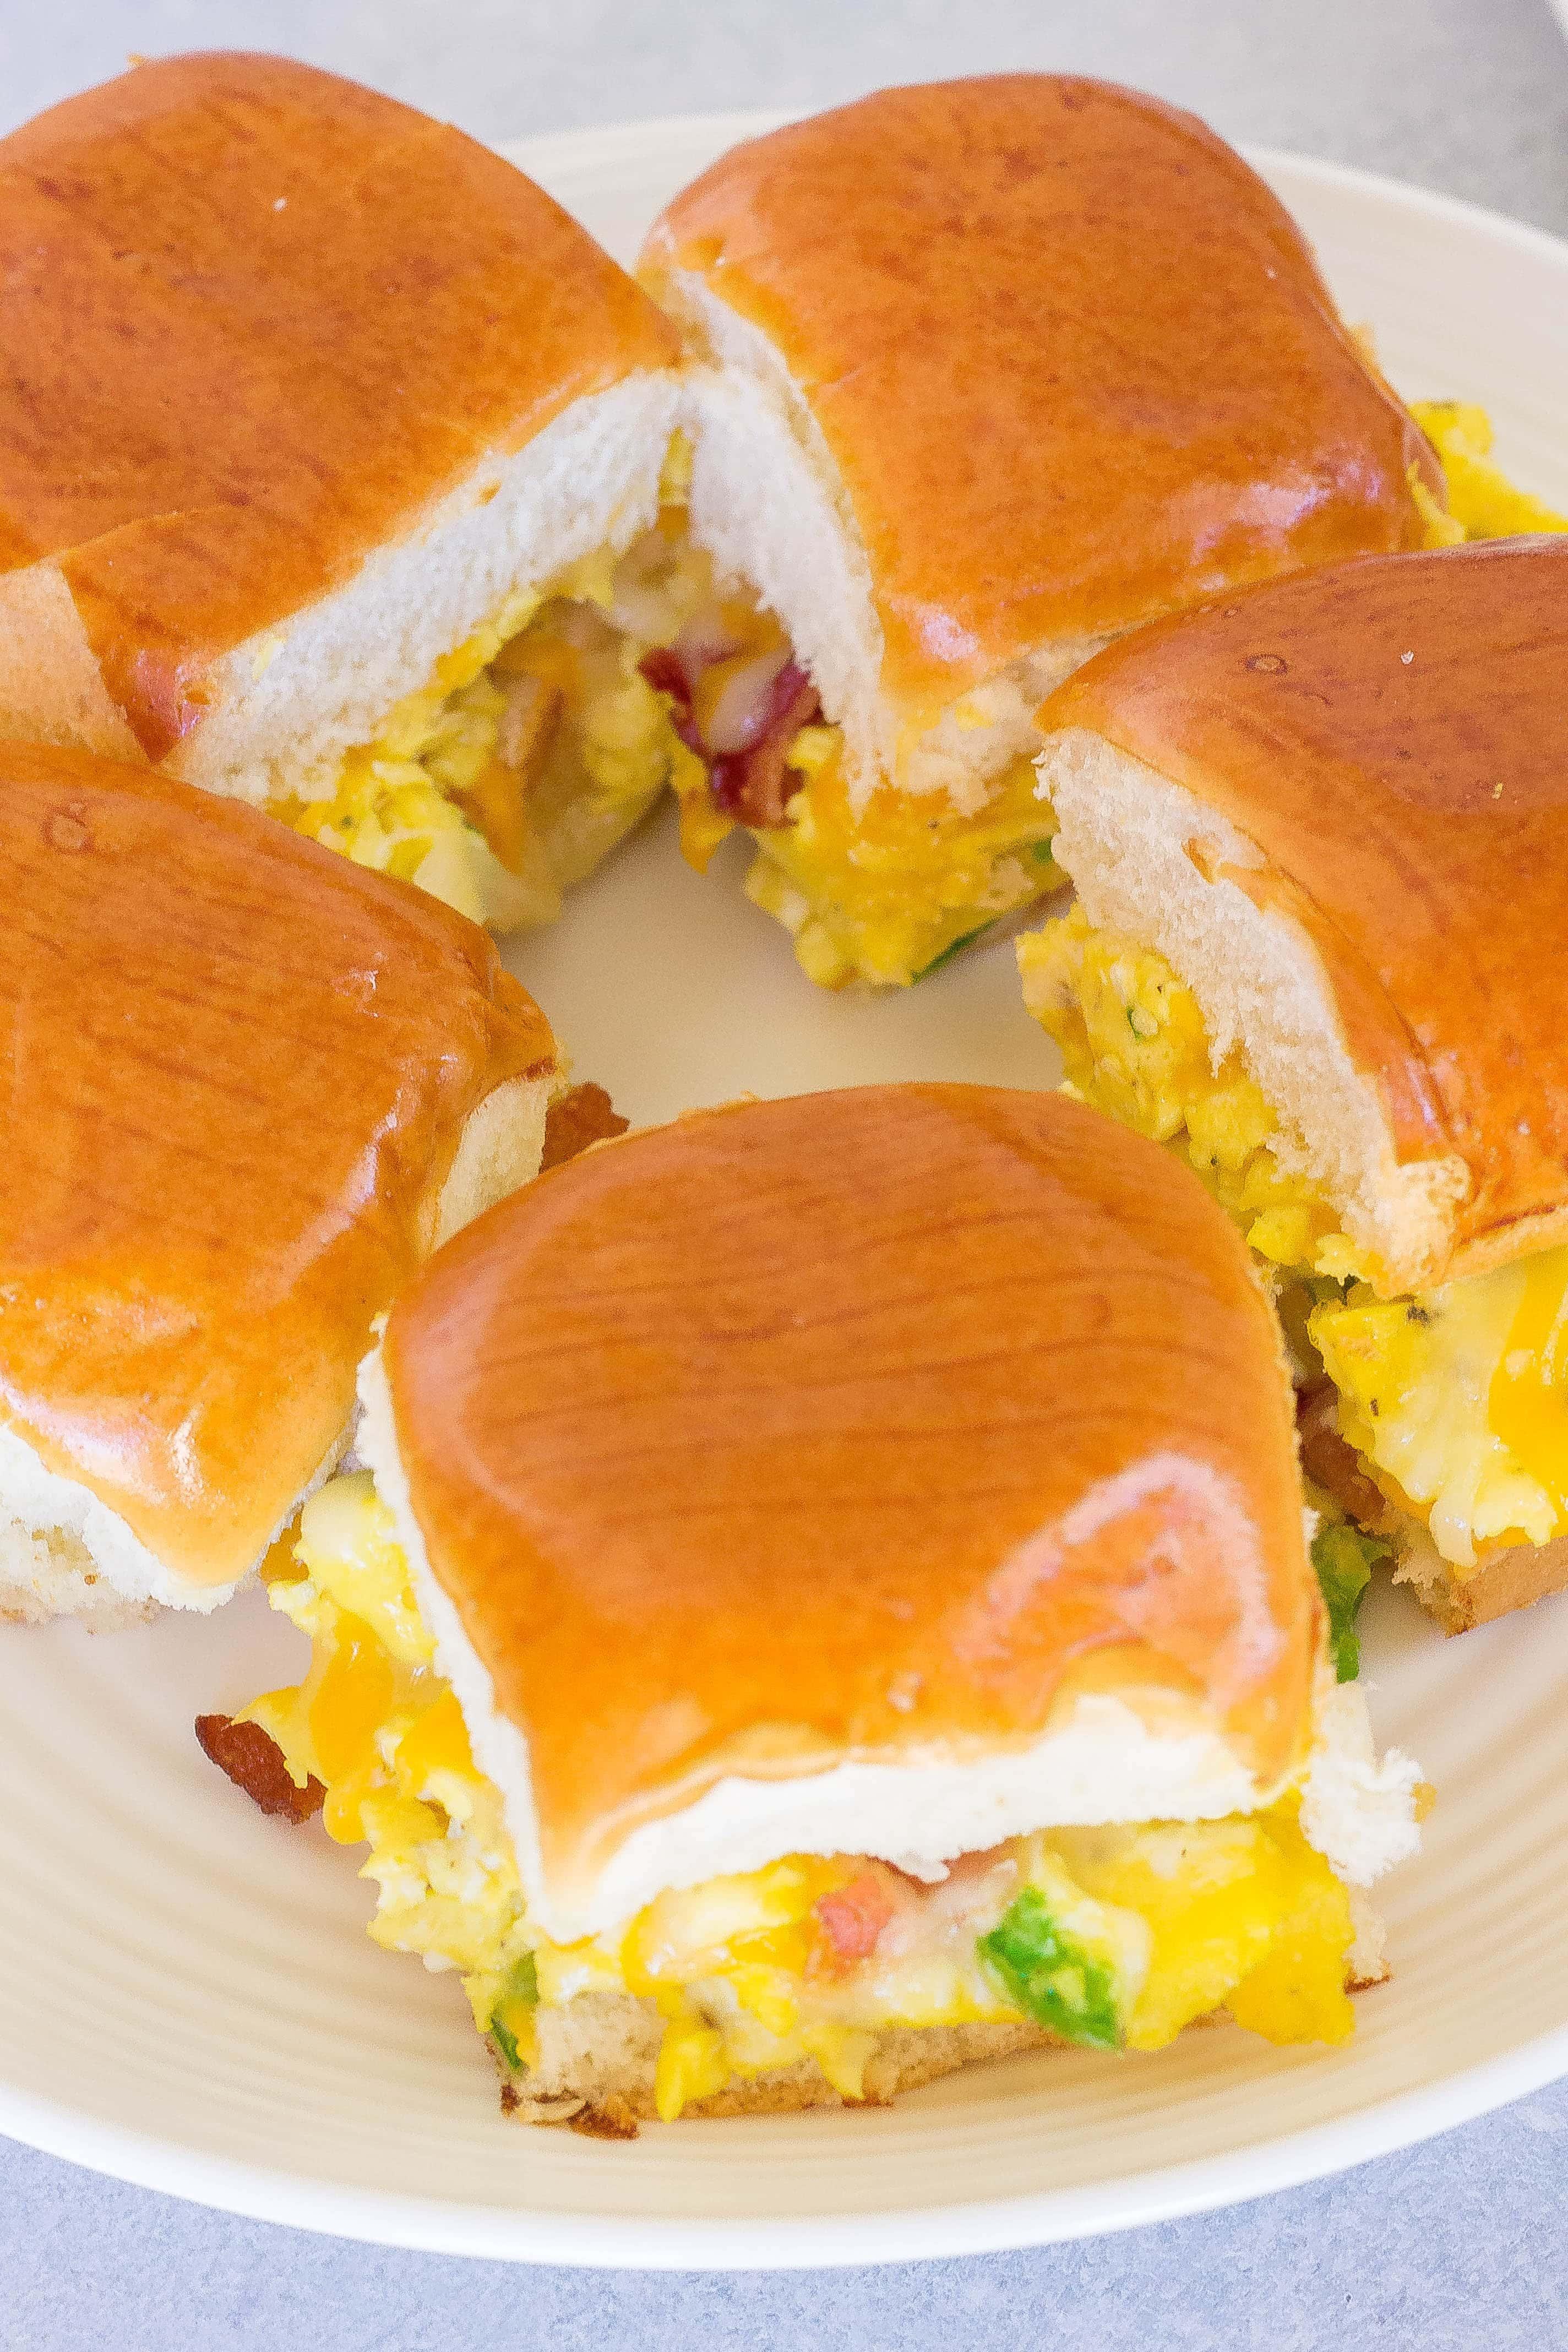 Cheesy Egg & Bacon Breakfast Sliders